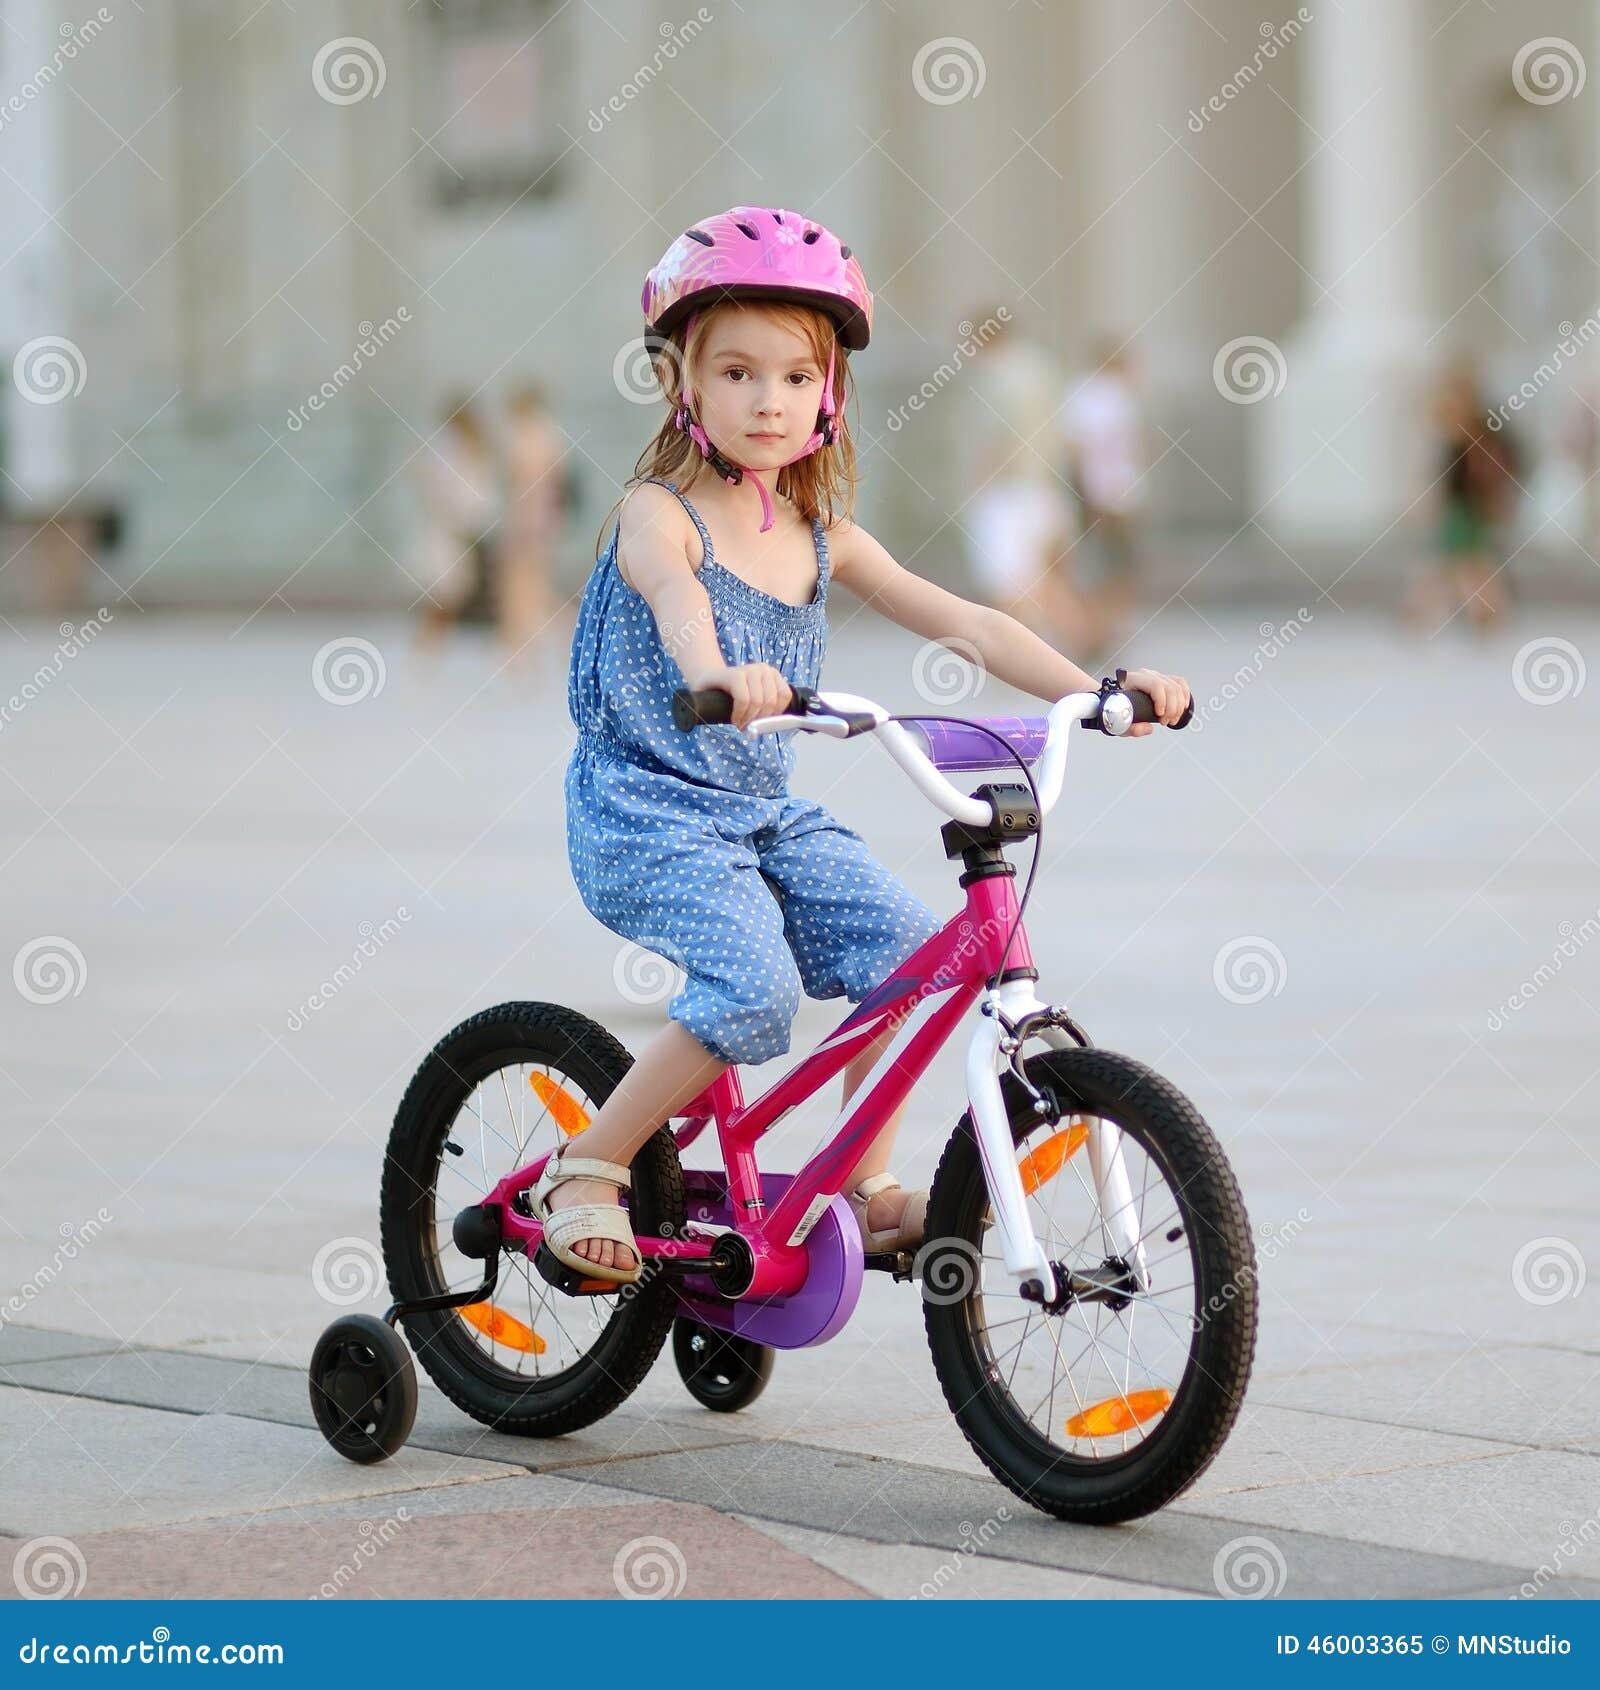 petite fille conduisant un v lo photo stock image 46003365. Black Bedroom Furniture Sets. Home Design Ideas